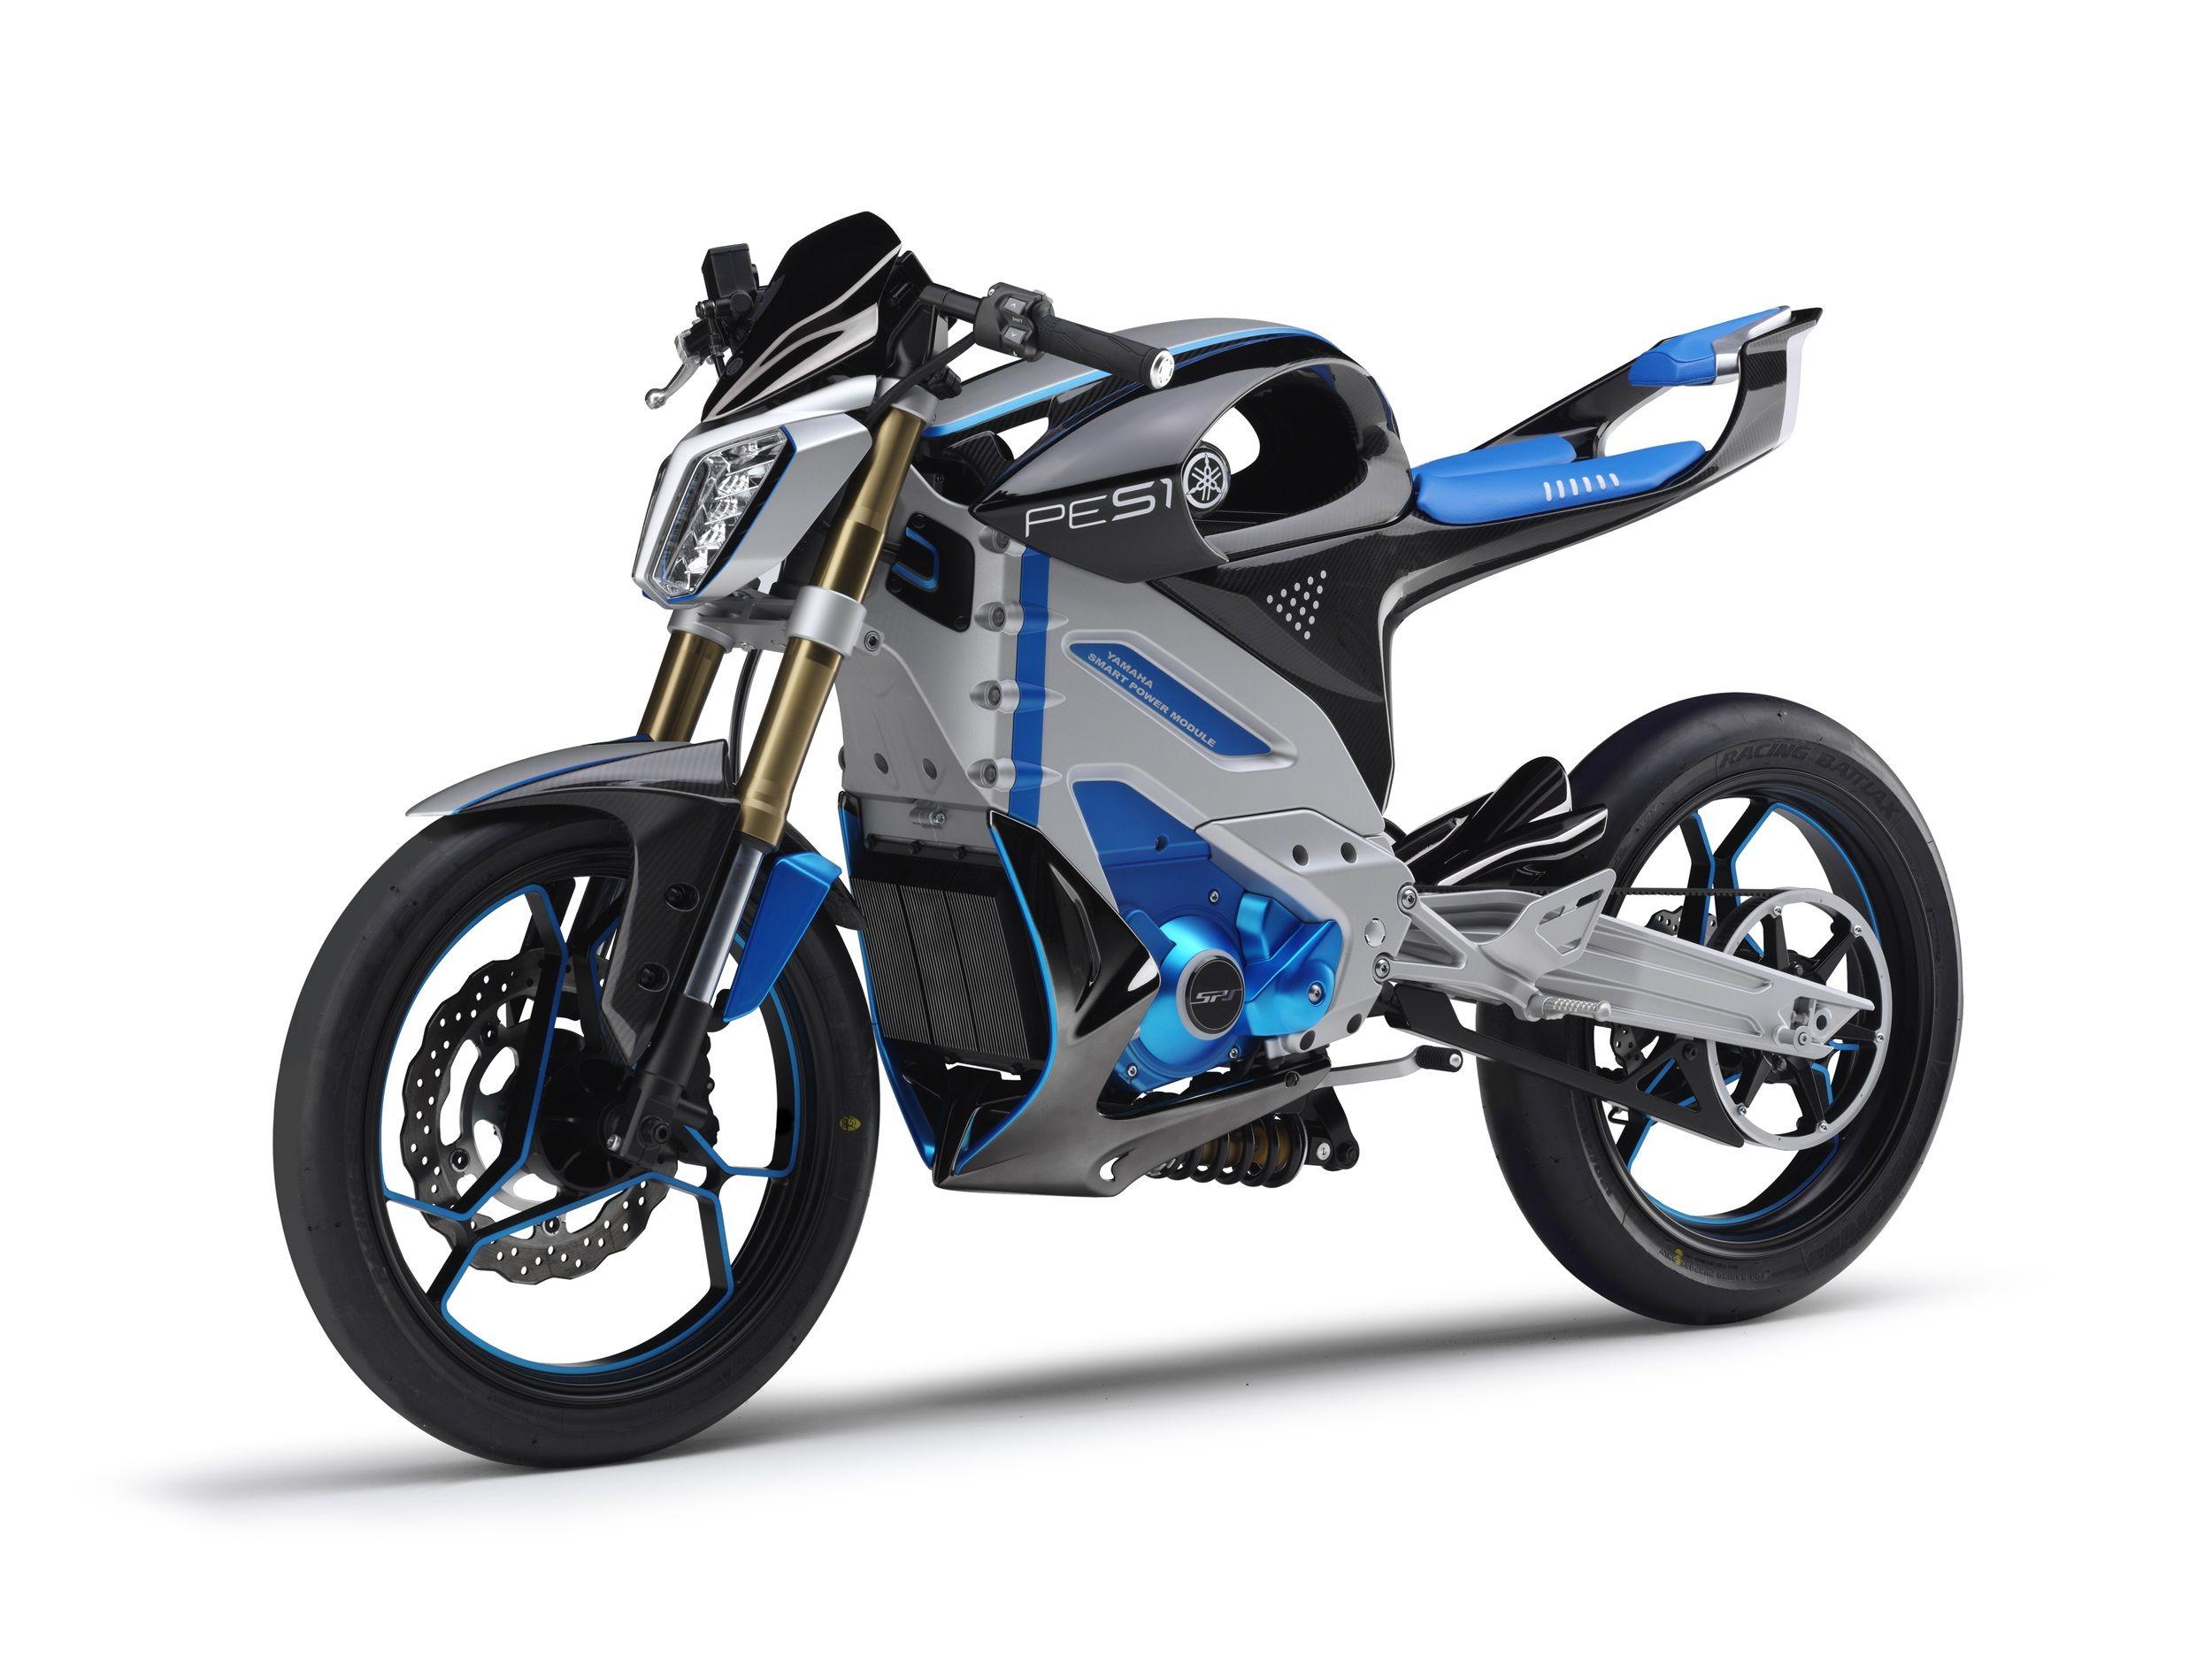 Yamaha S Pes Electric Bike Hint Motorcycle Magazine Motorrad International Electric Motorcycle Tokyo Motor Show Motorcycle Design